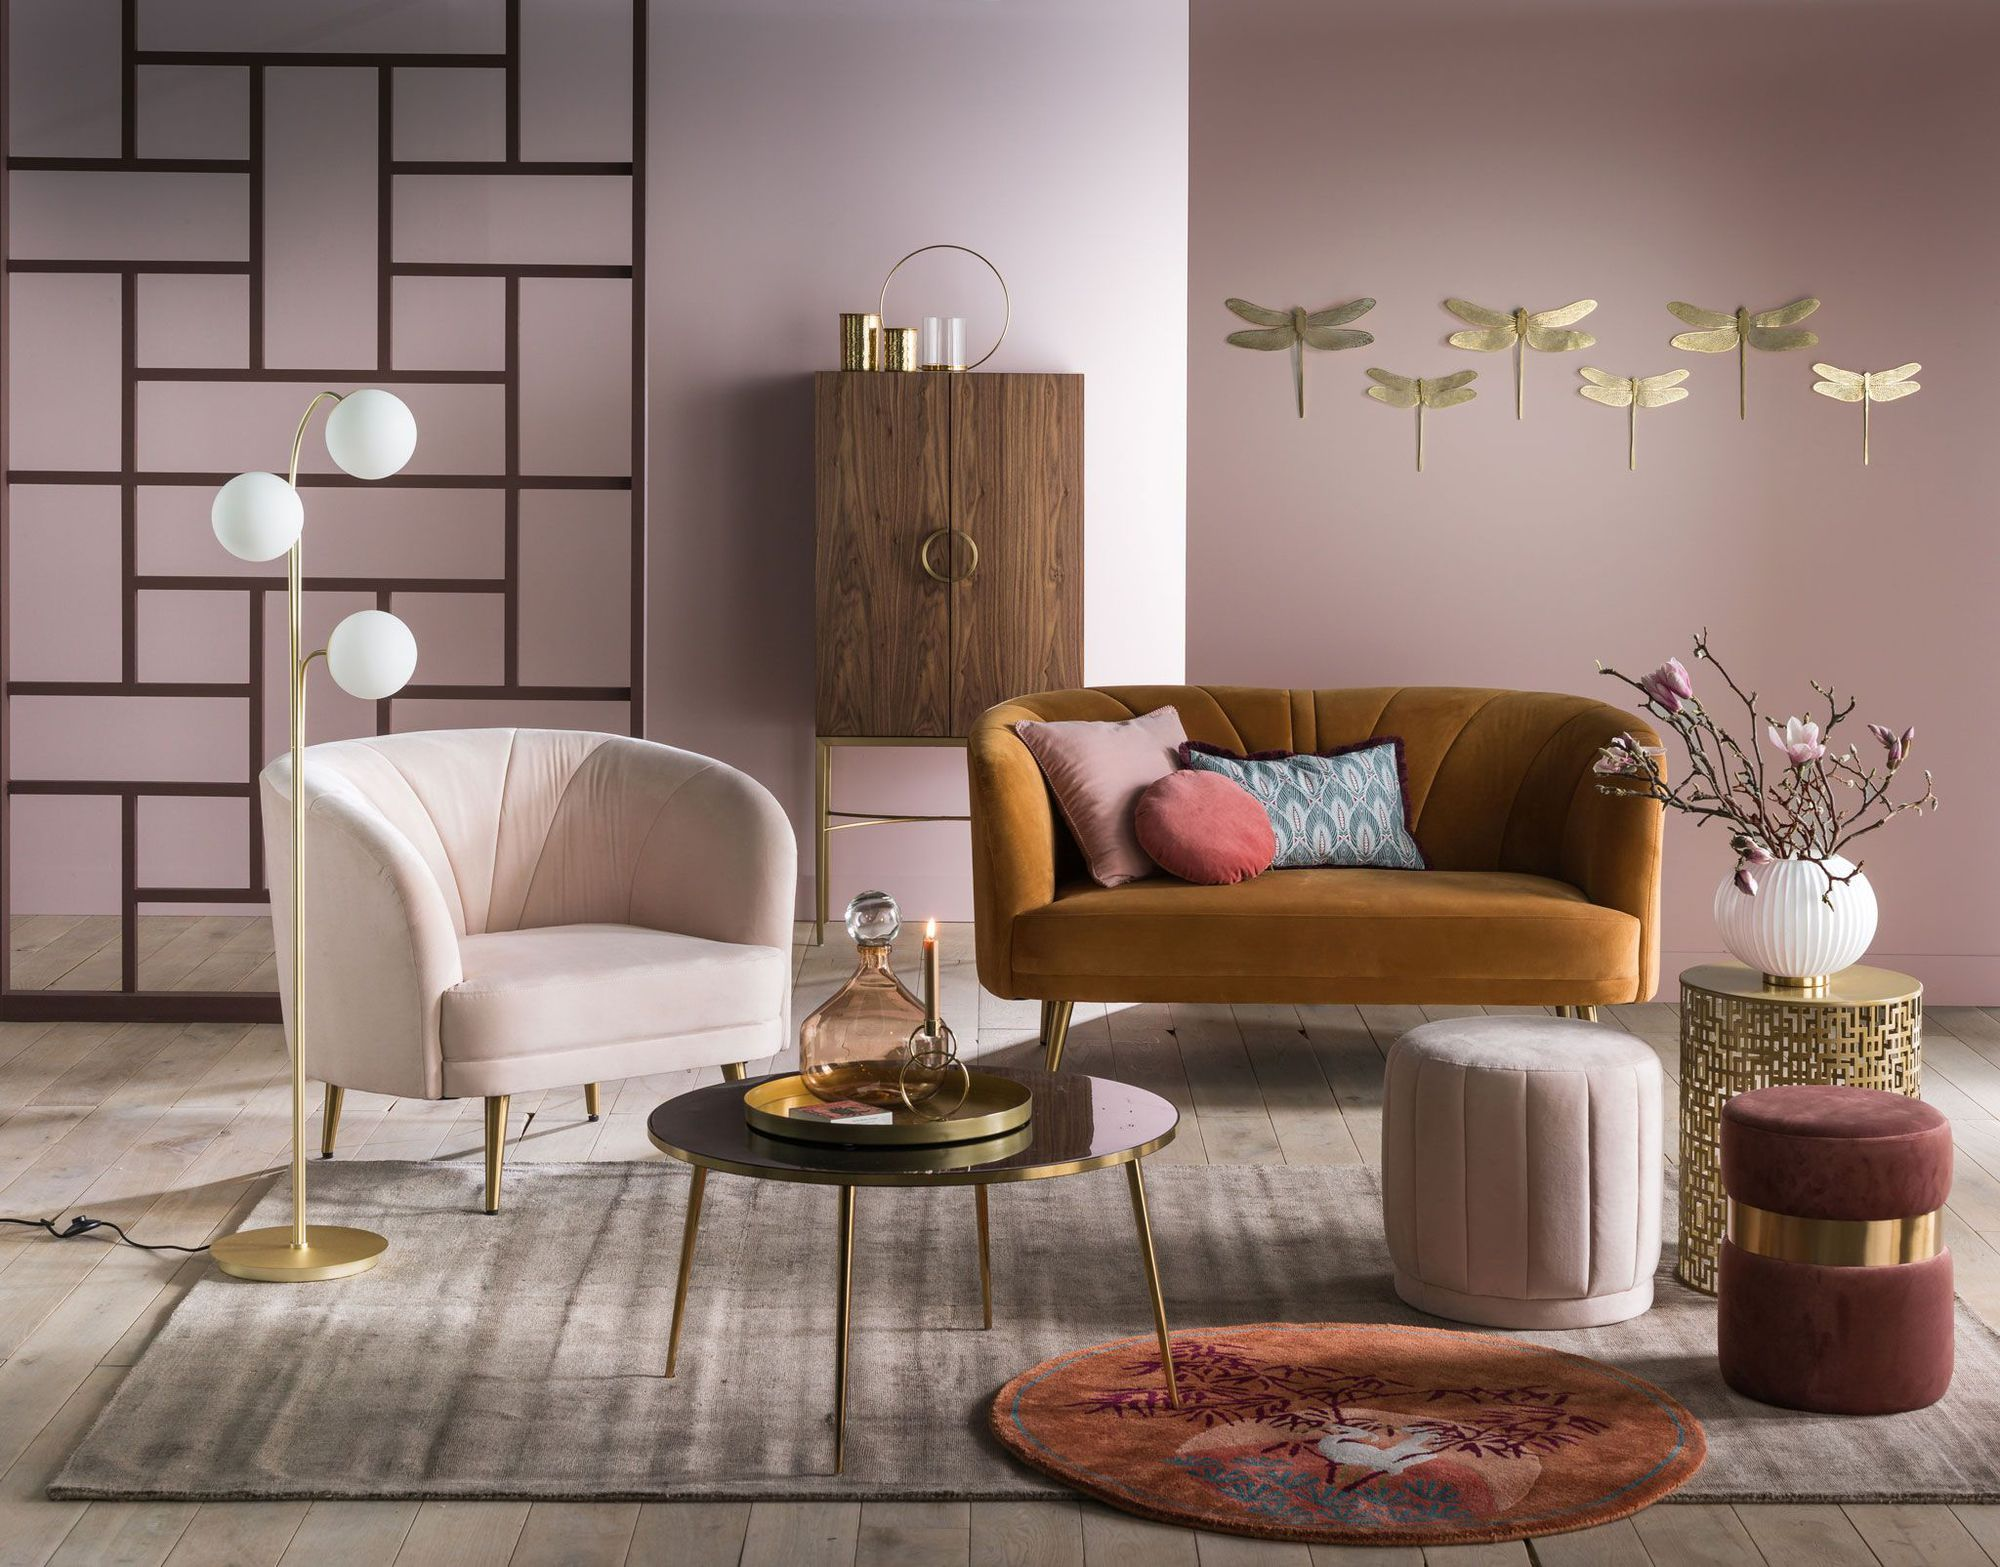 lubna möbel chowdhary tiled la nouvelle collection redoute intérieurs 20182019 planete deco homes world